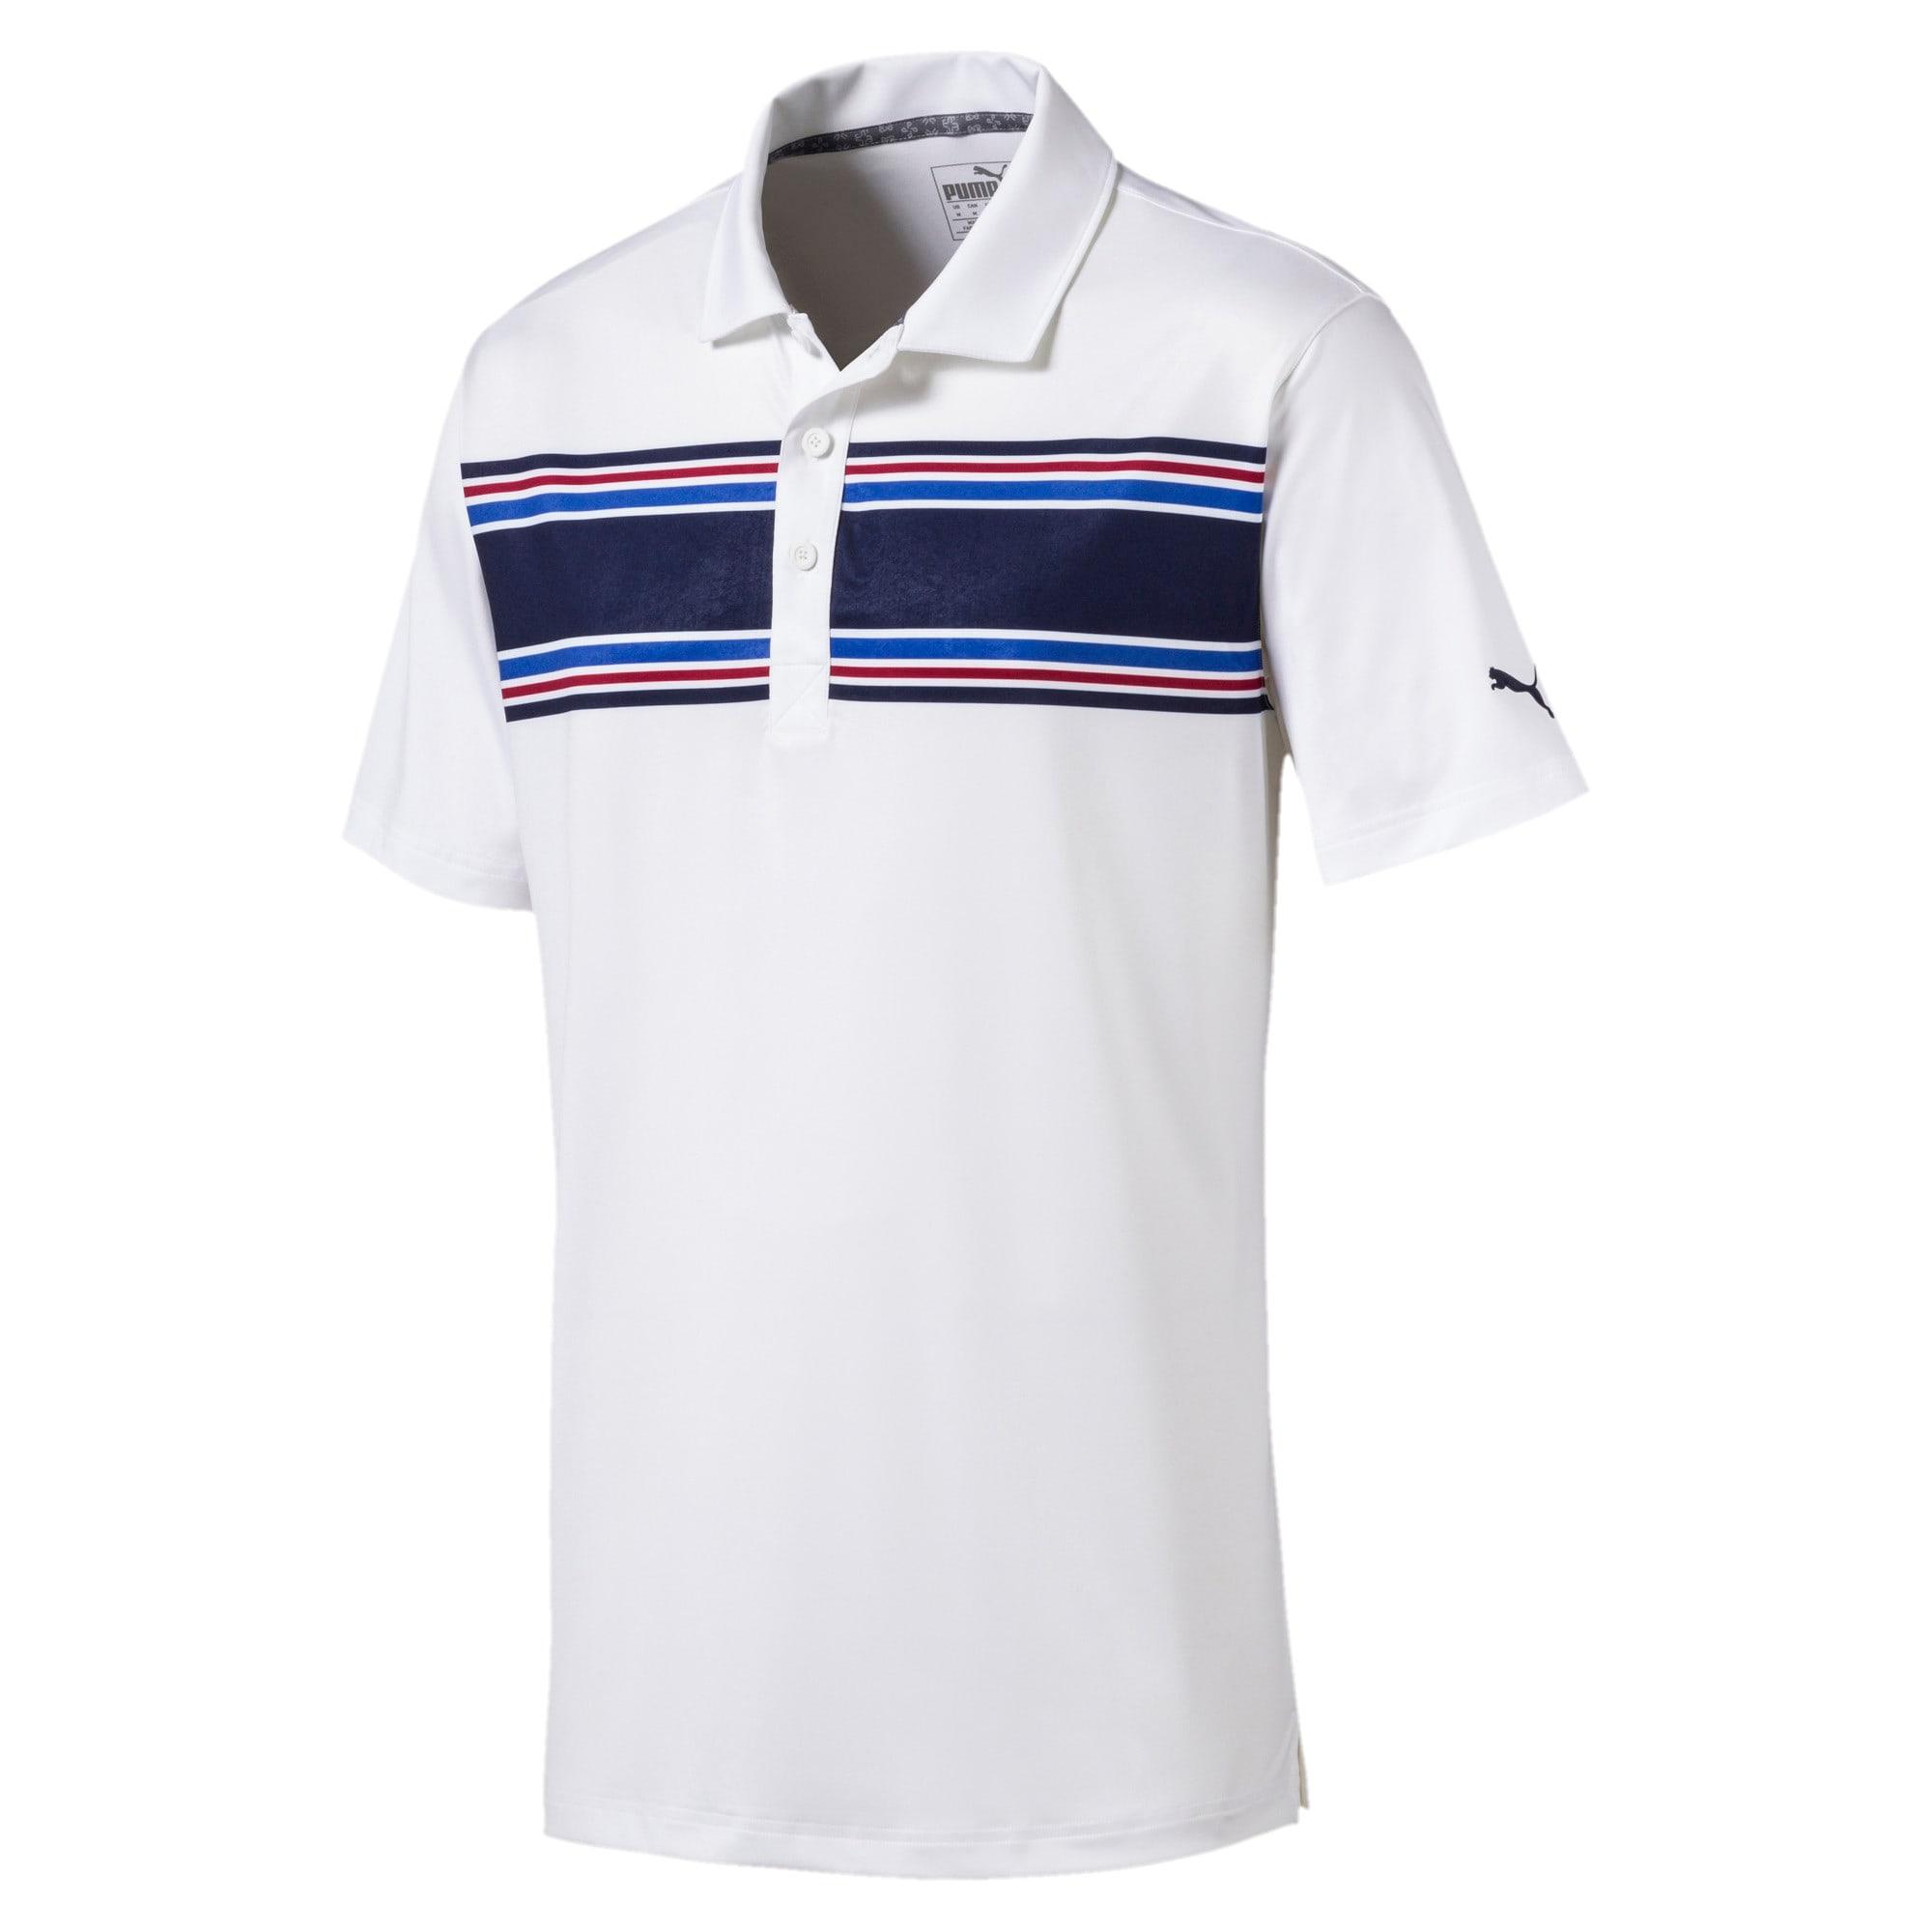 Miniatura 1 de Camiseta tipo polo Montauk para hombre, Peacoat, mediano